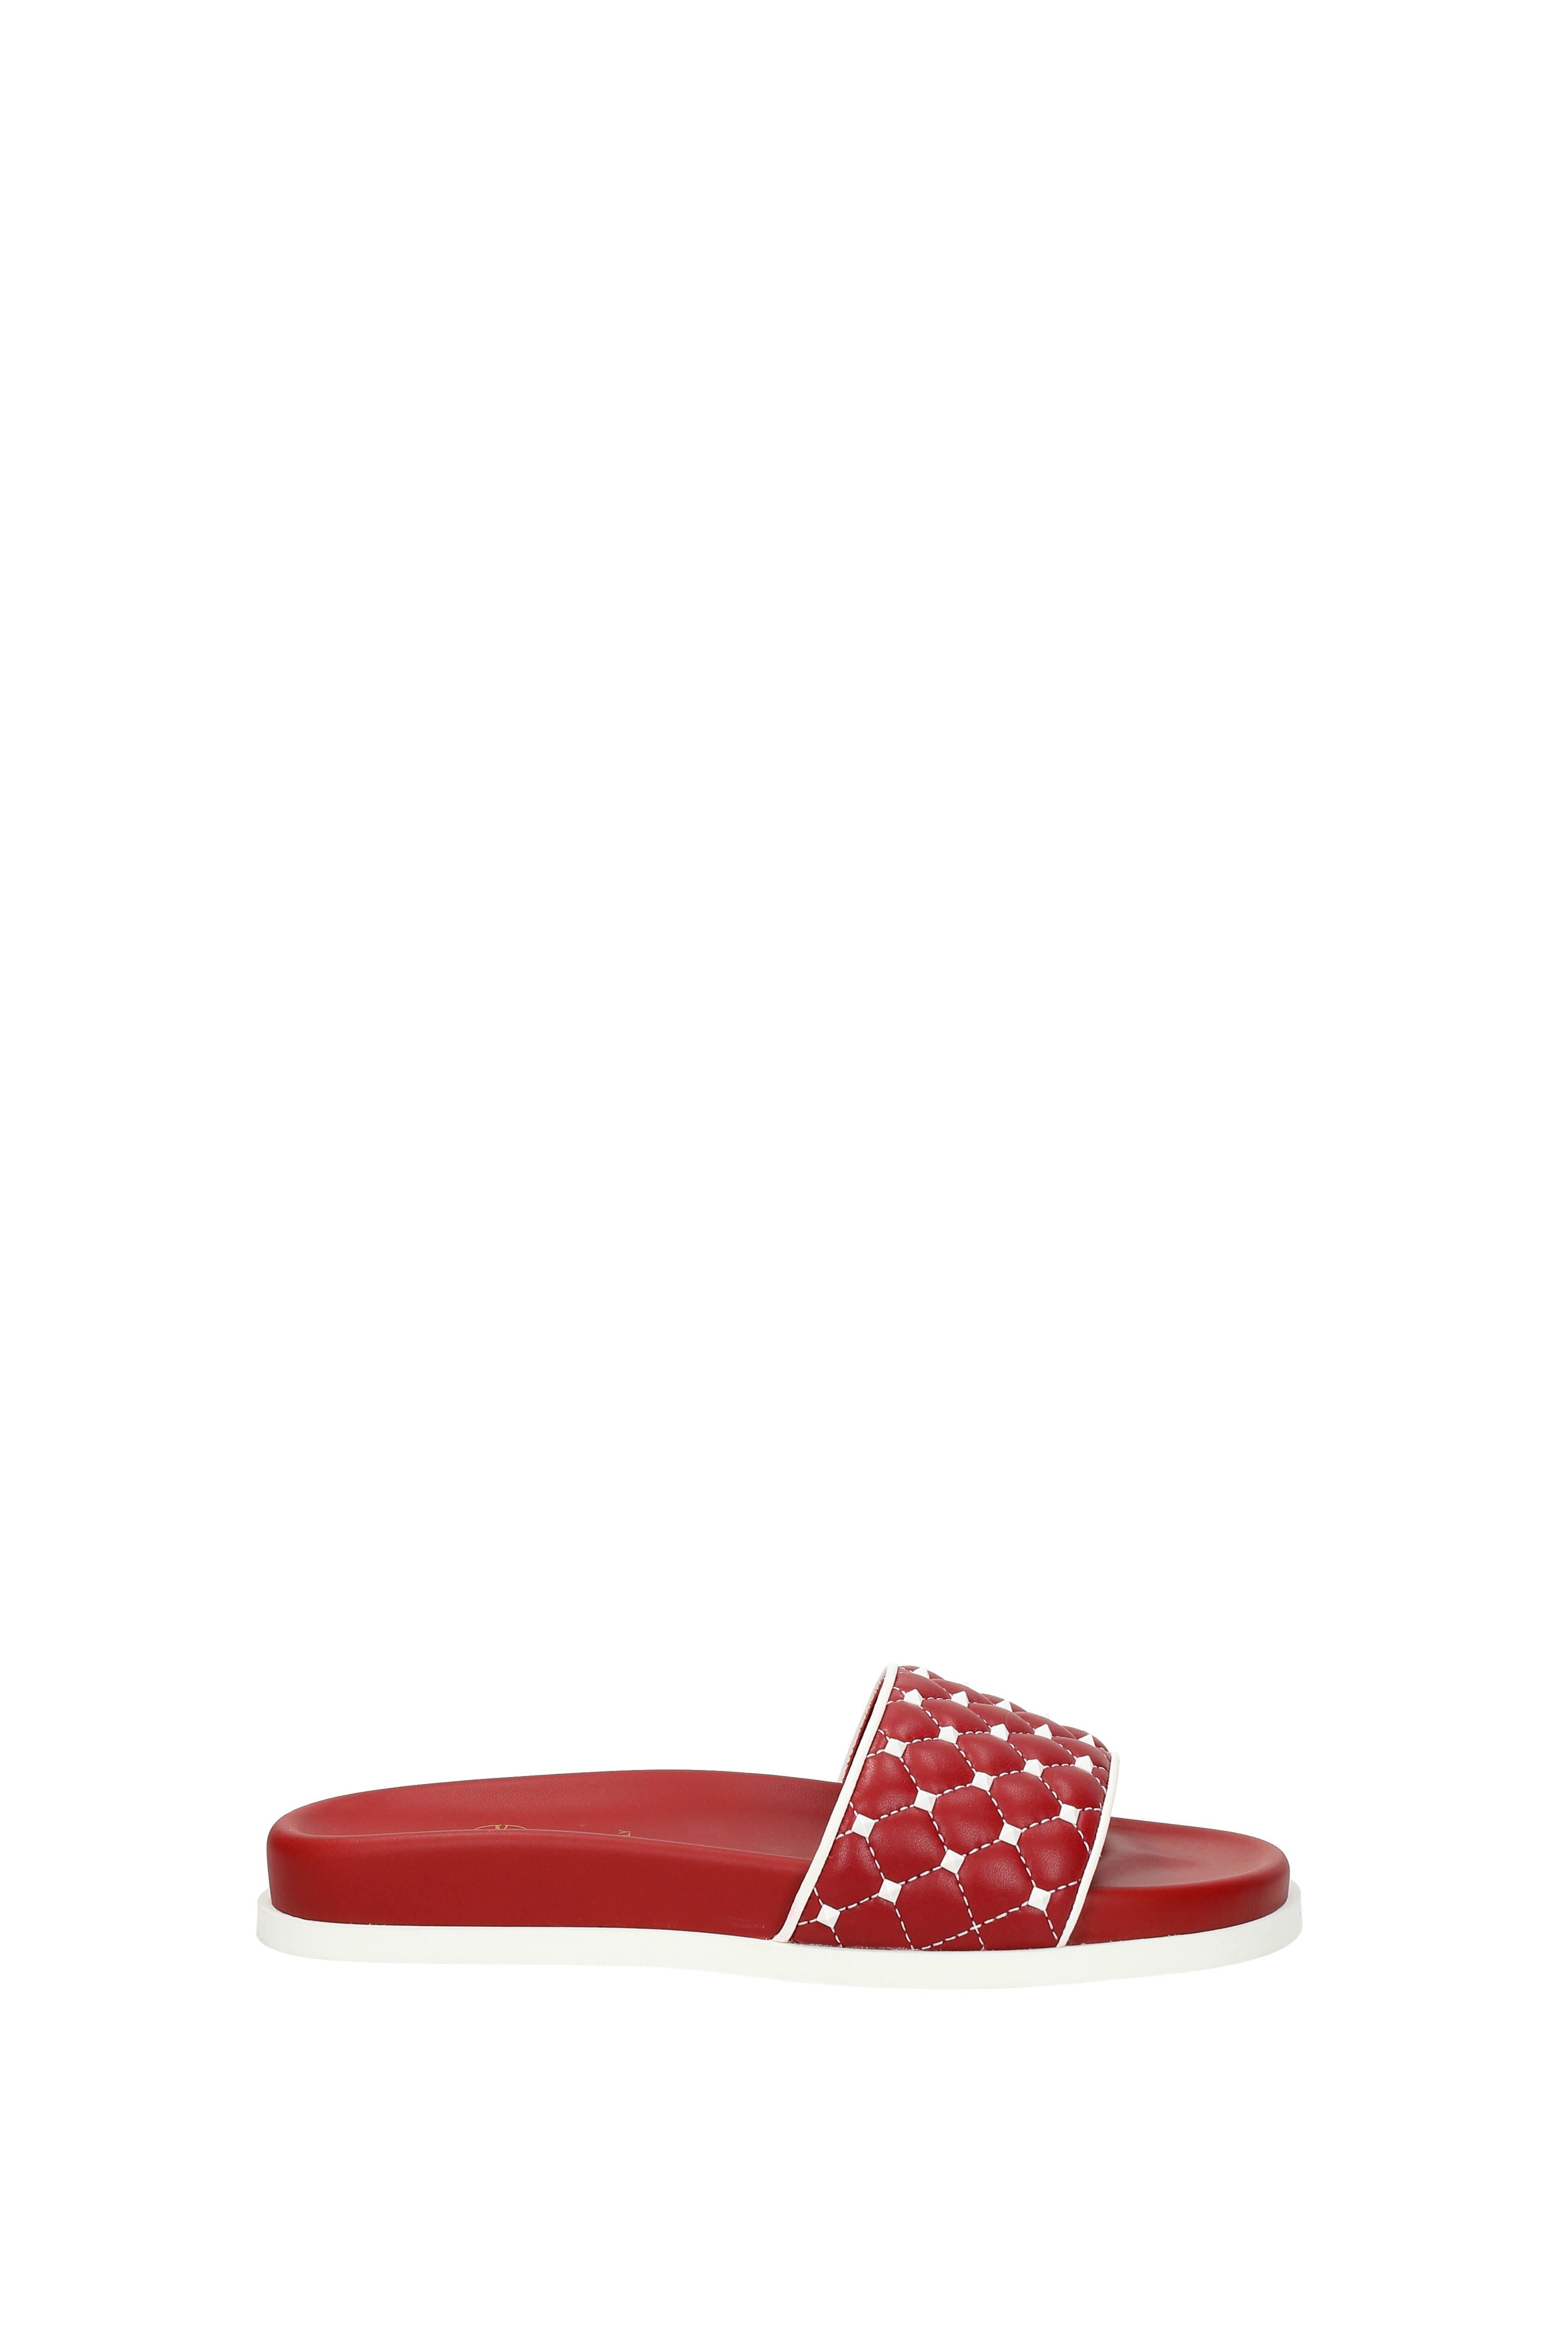 Flip-Flops Garavani und Holzschuhe Valentino Garavani Flip-Flops Damen - Leder (2S0F01RVH) 9fbc9e